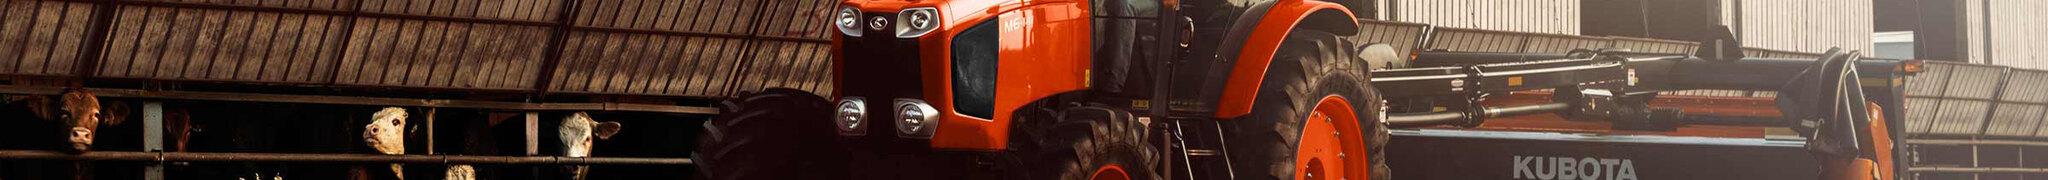 Kubota Dealer in Holland, Manitoba, Drummond Farm Service